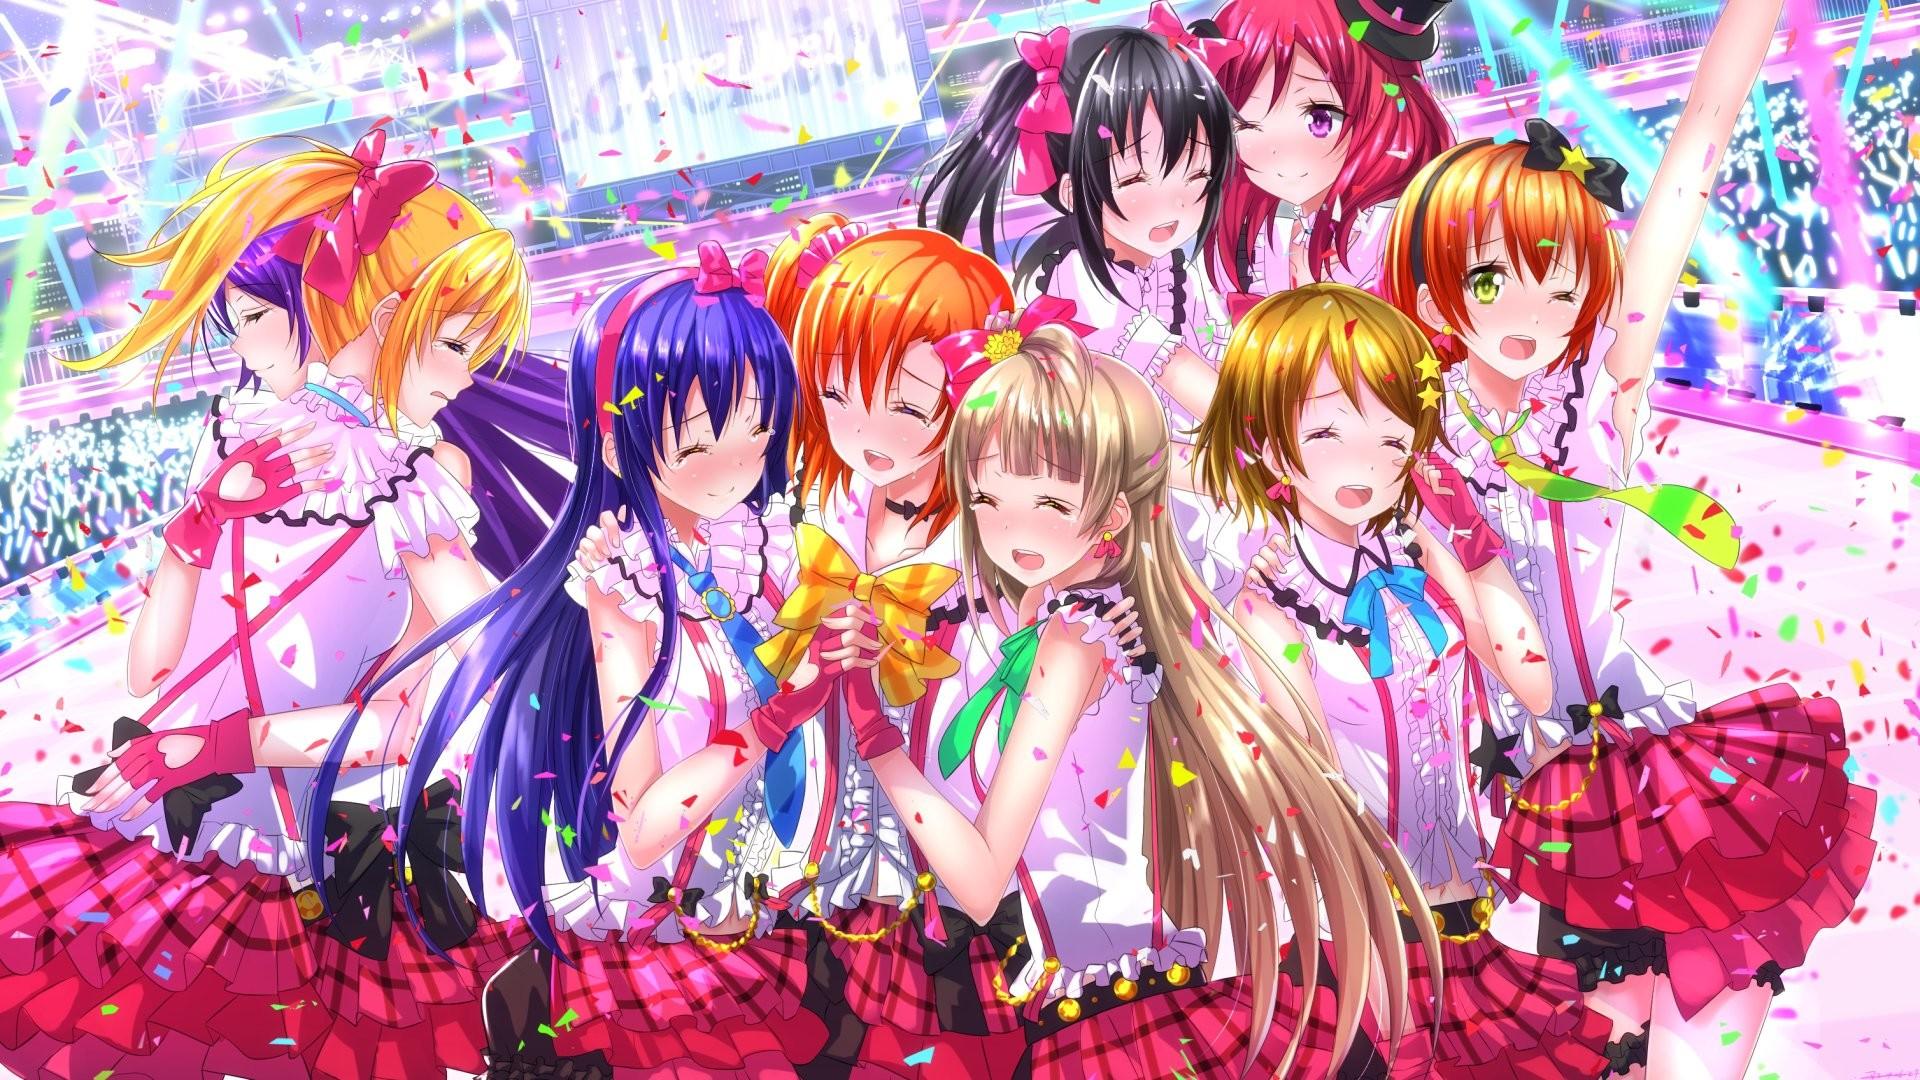 HD Love Live Wallpaper